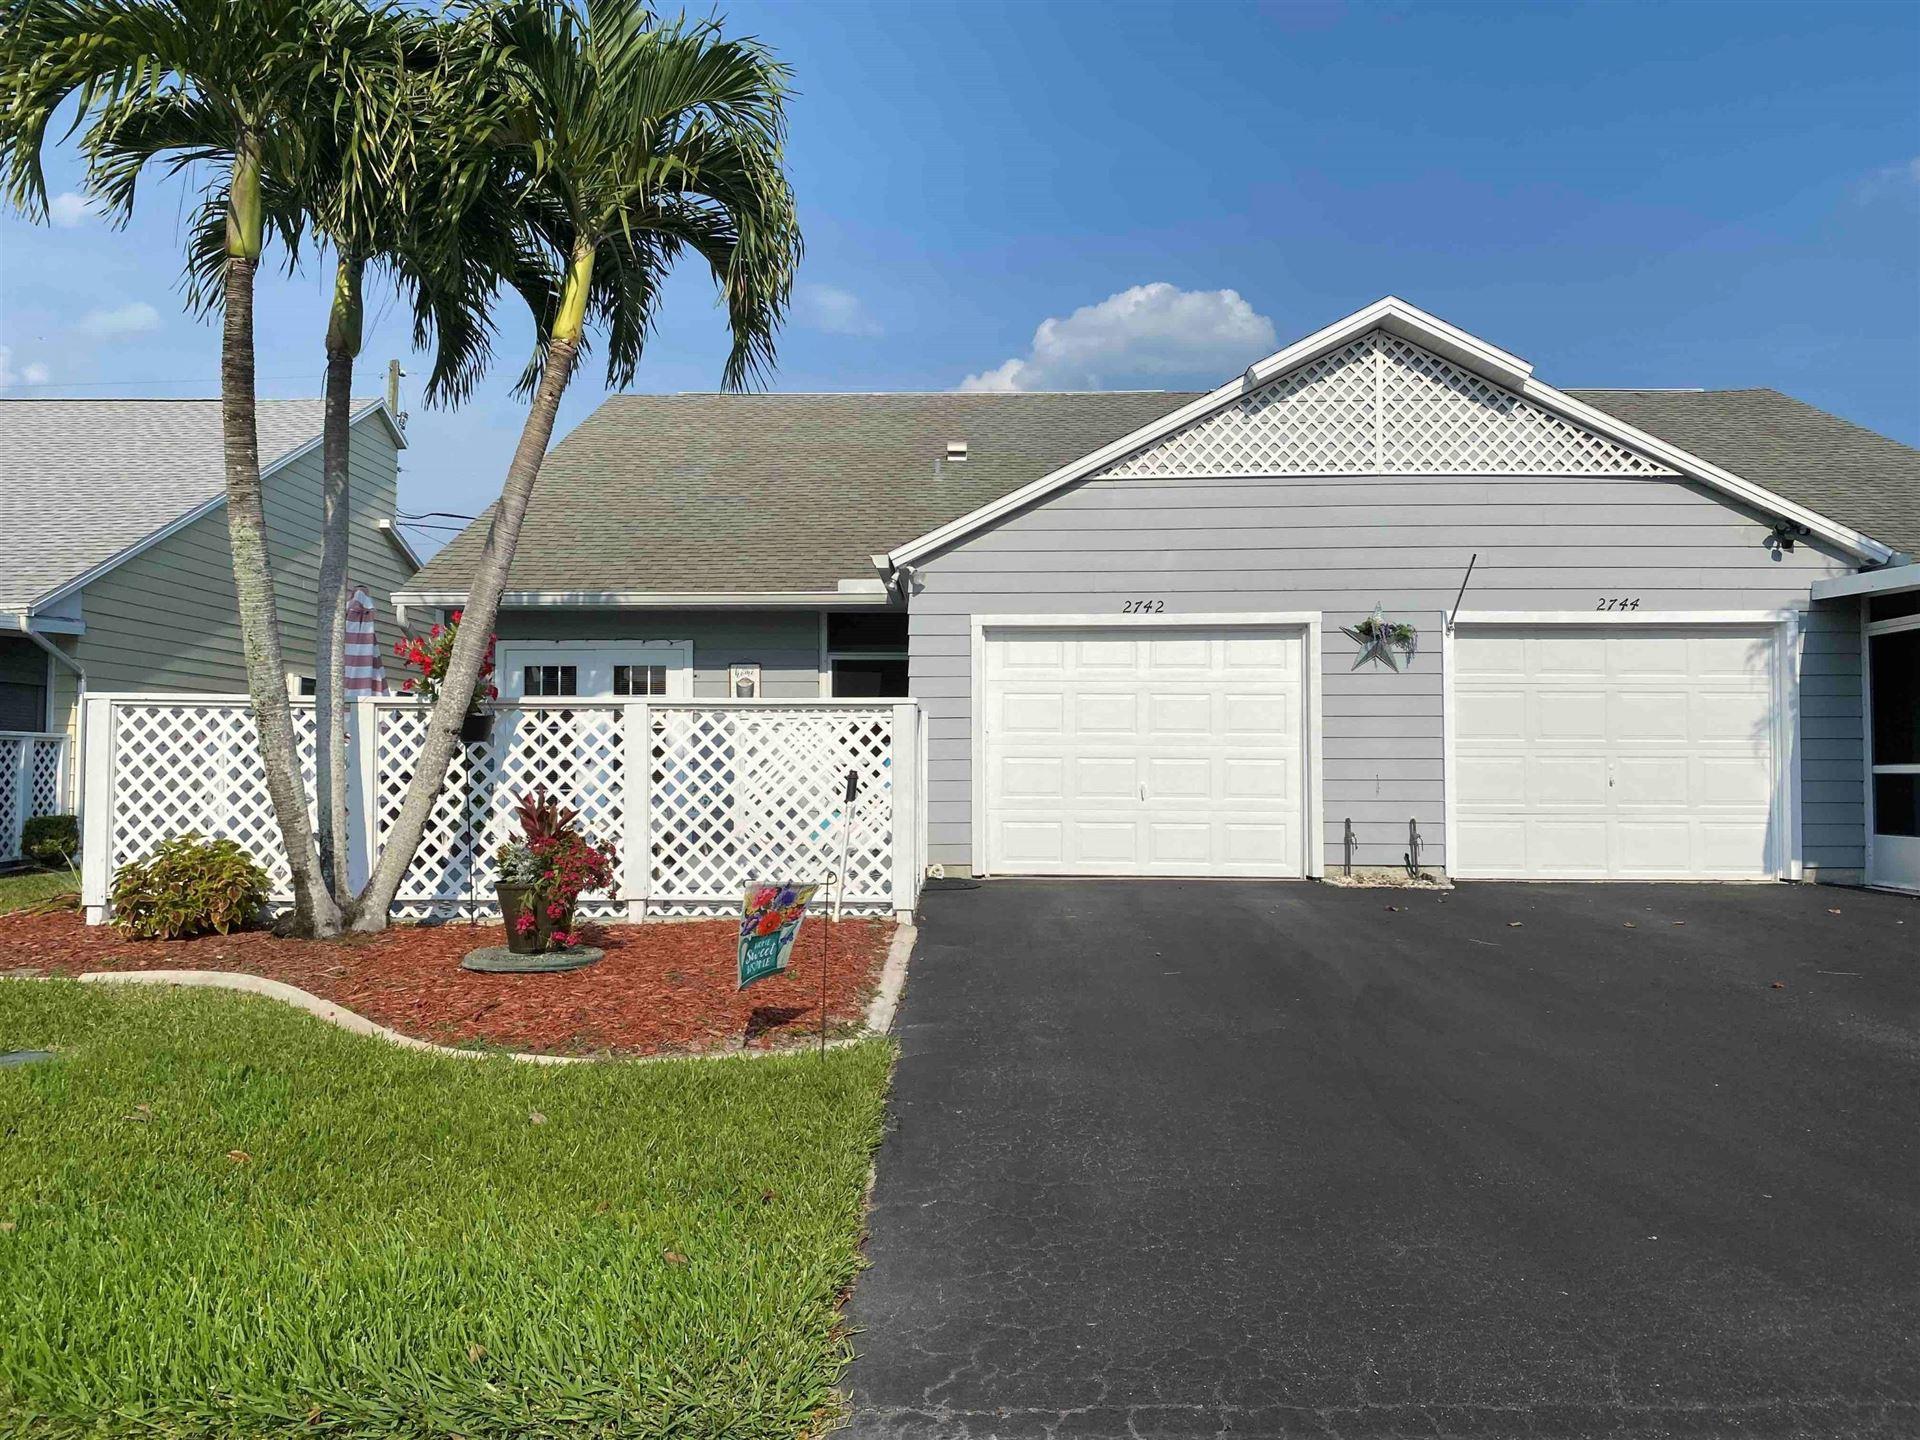 2742 SE Tropical East Circle, Port Saint Lucie, FL 34952 - MLS#: RX-10709286